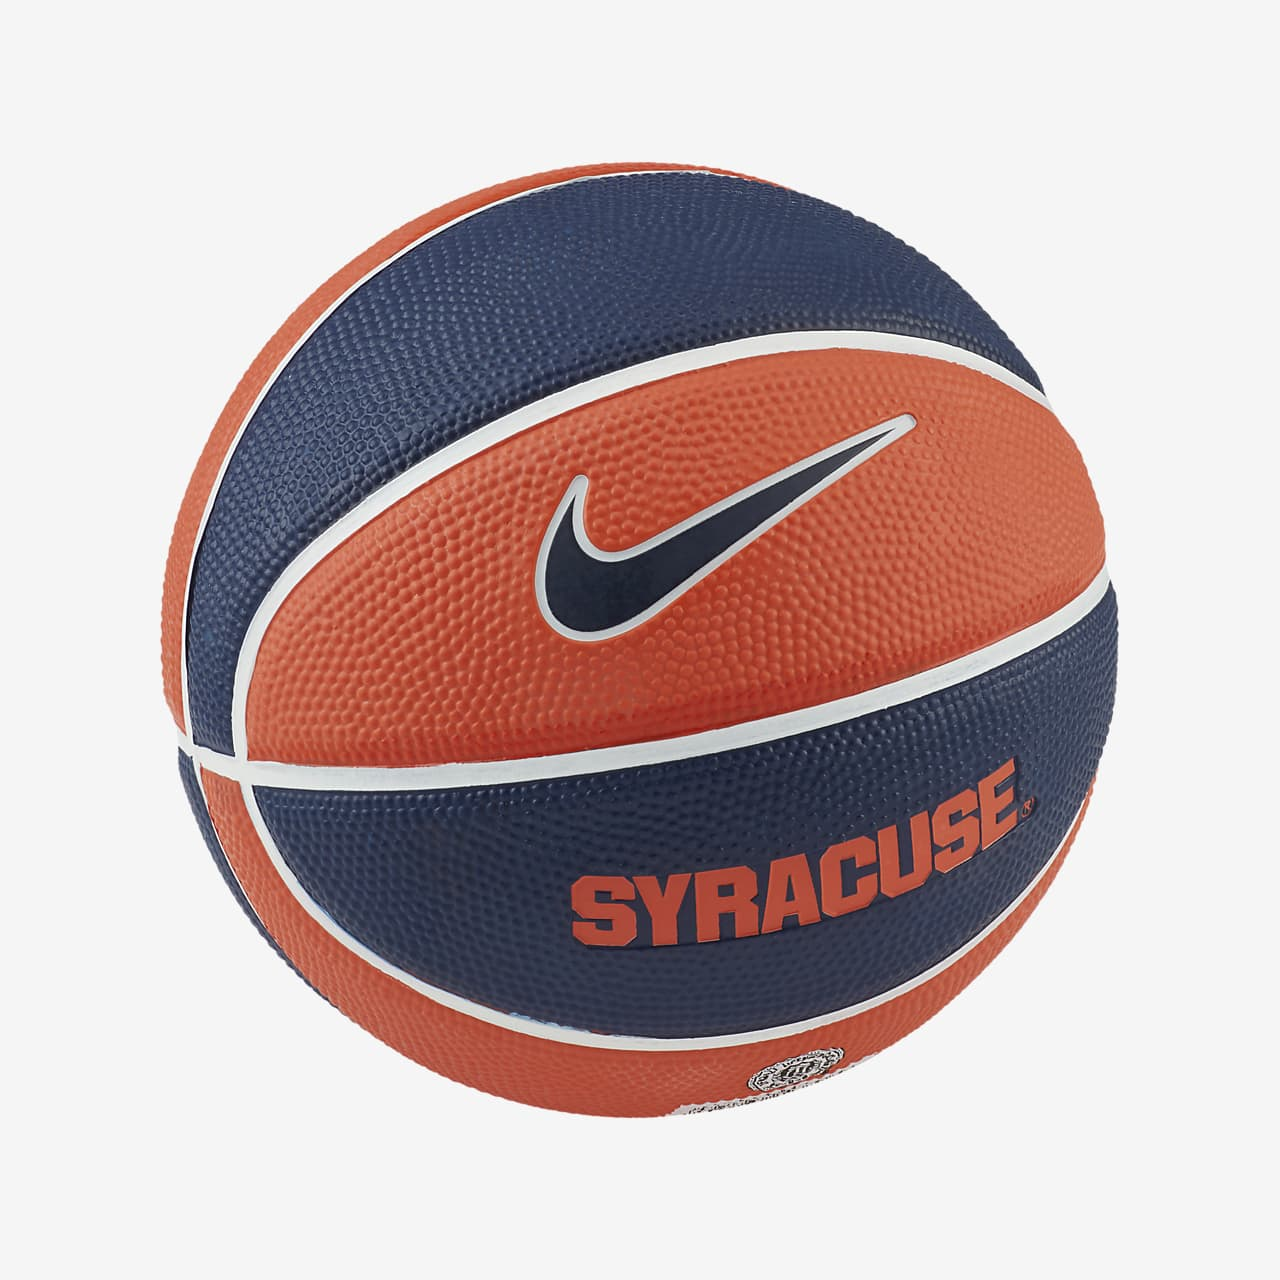 Nike College Mini (Syracuse) Basketball